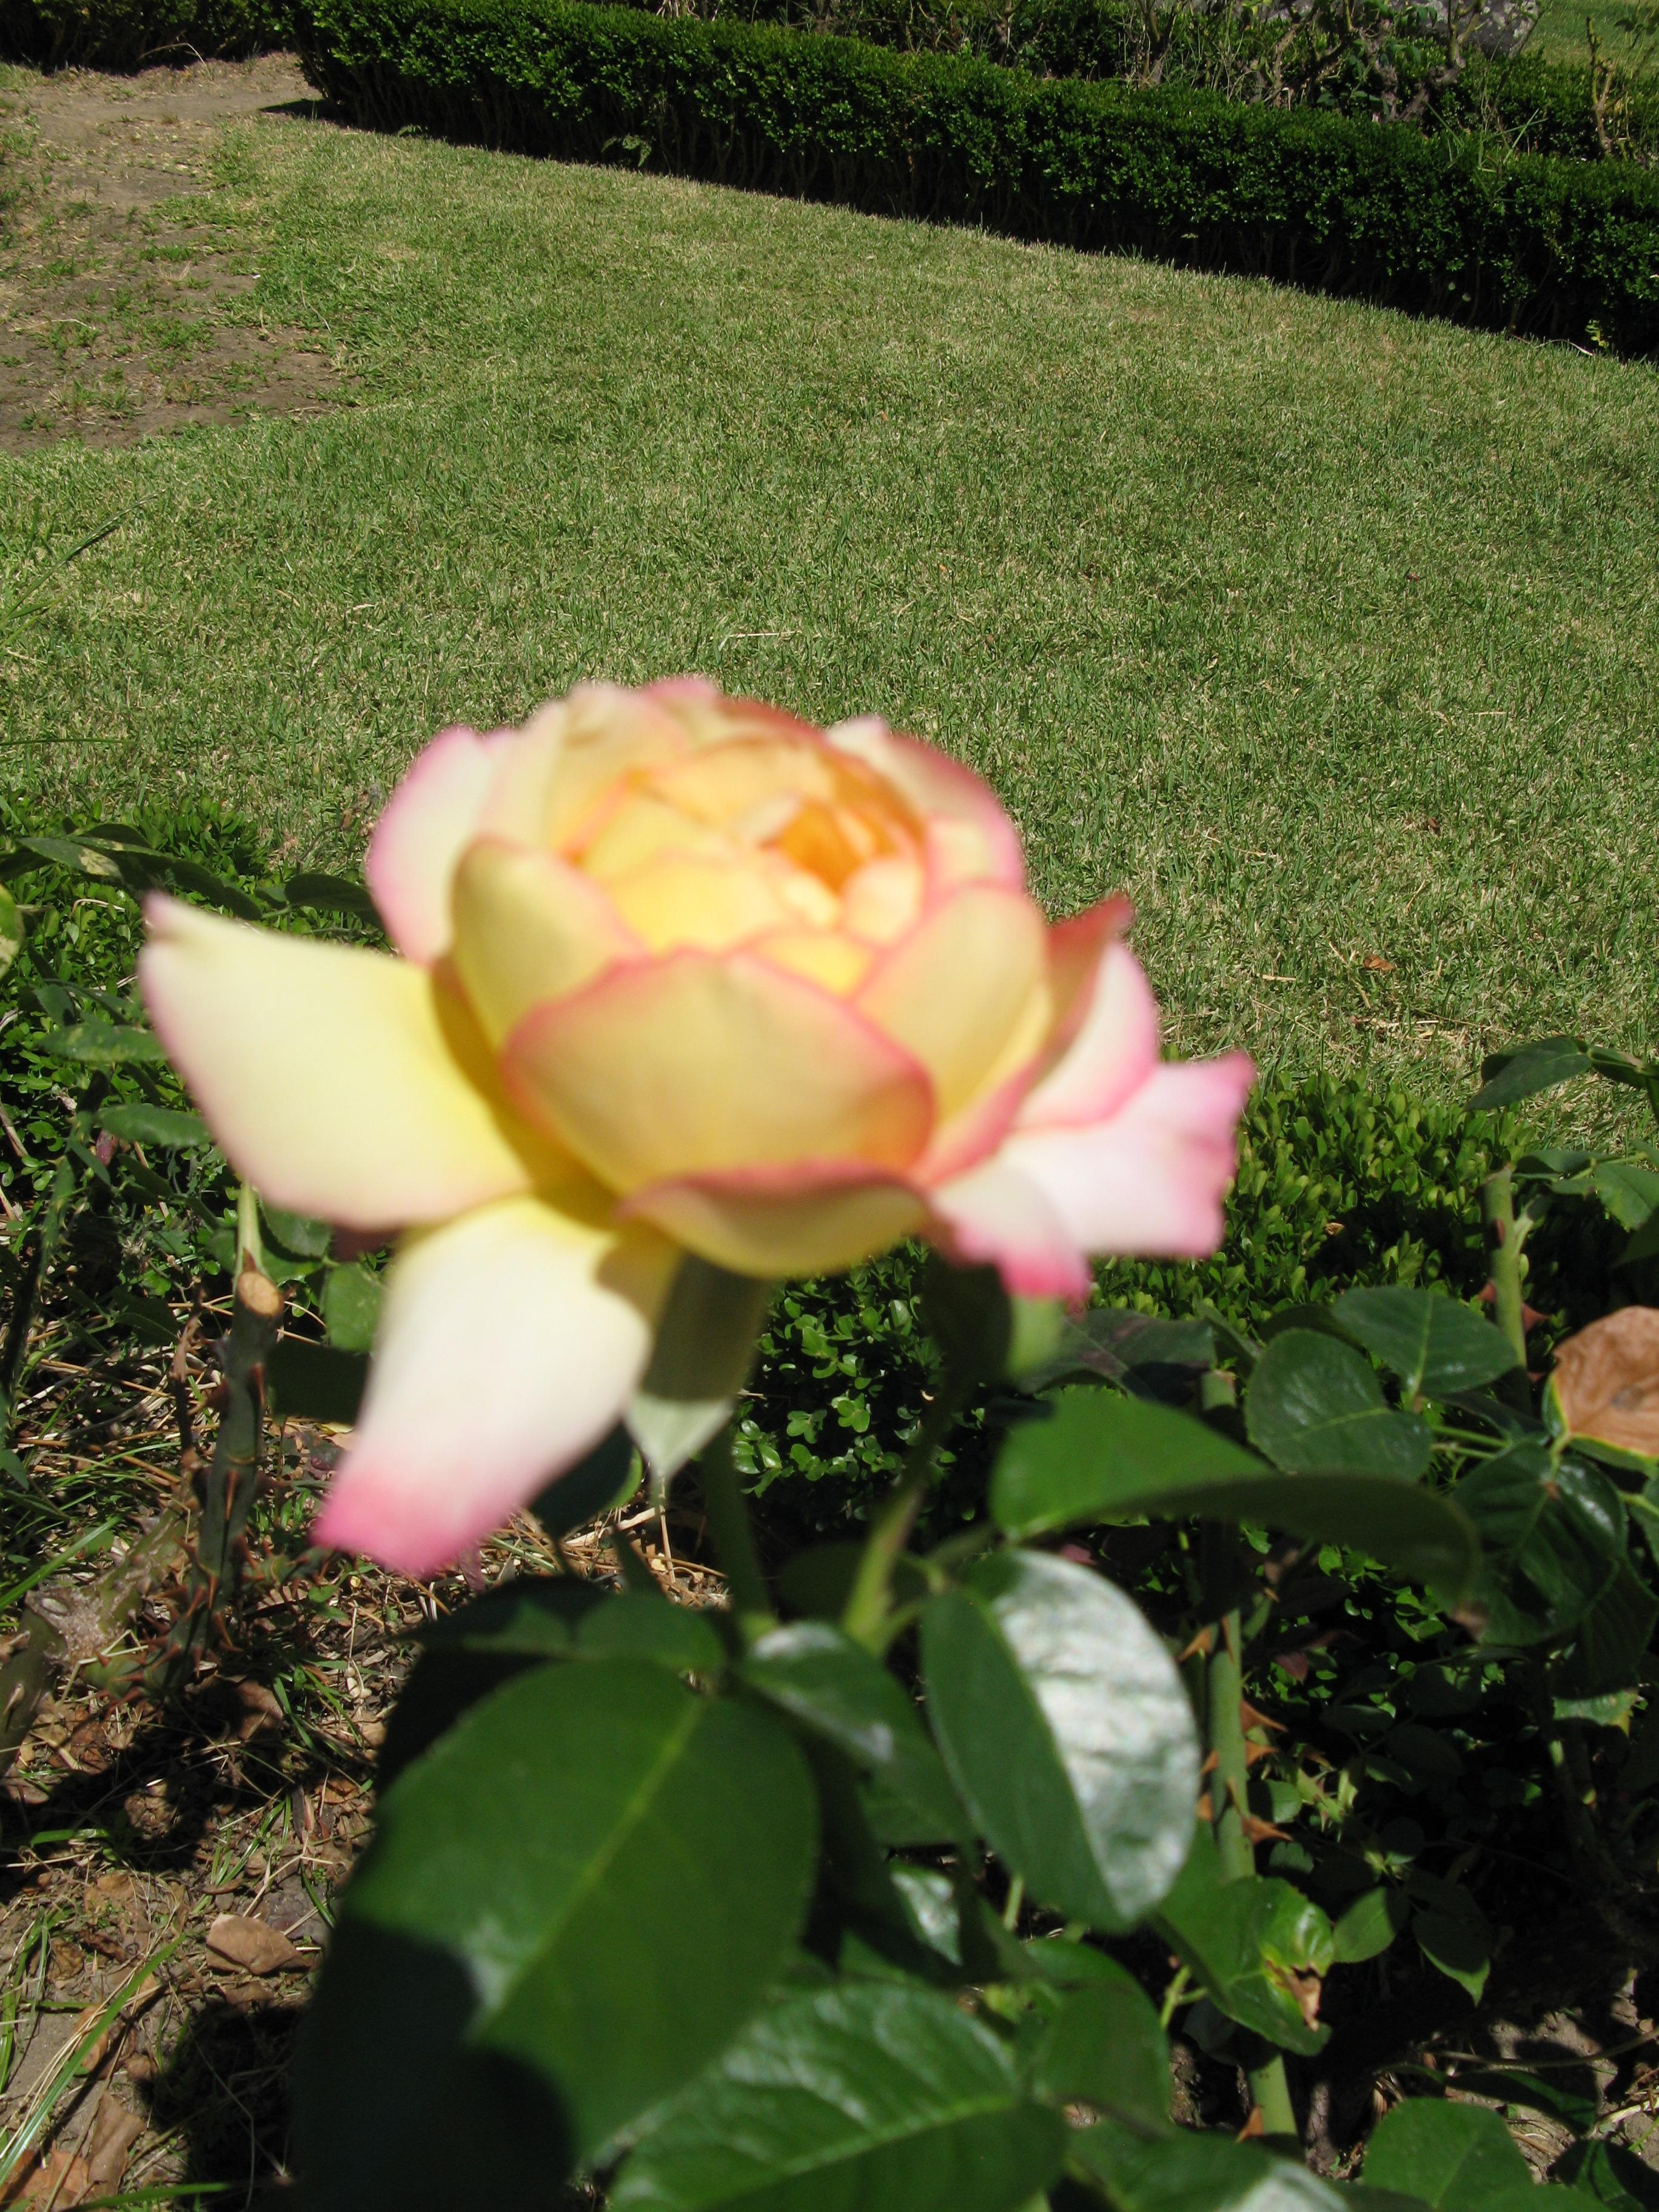 jardim rosas amarelas : jardim rosas amarelas:Ficheiro:Jardim de Santa Bárbara (rosa amarela 3).JPG – Wikipédia